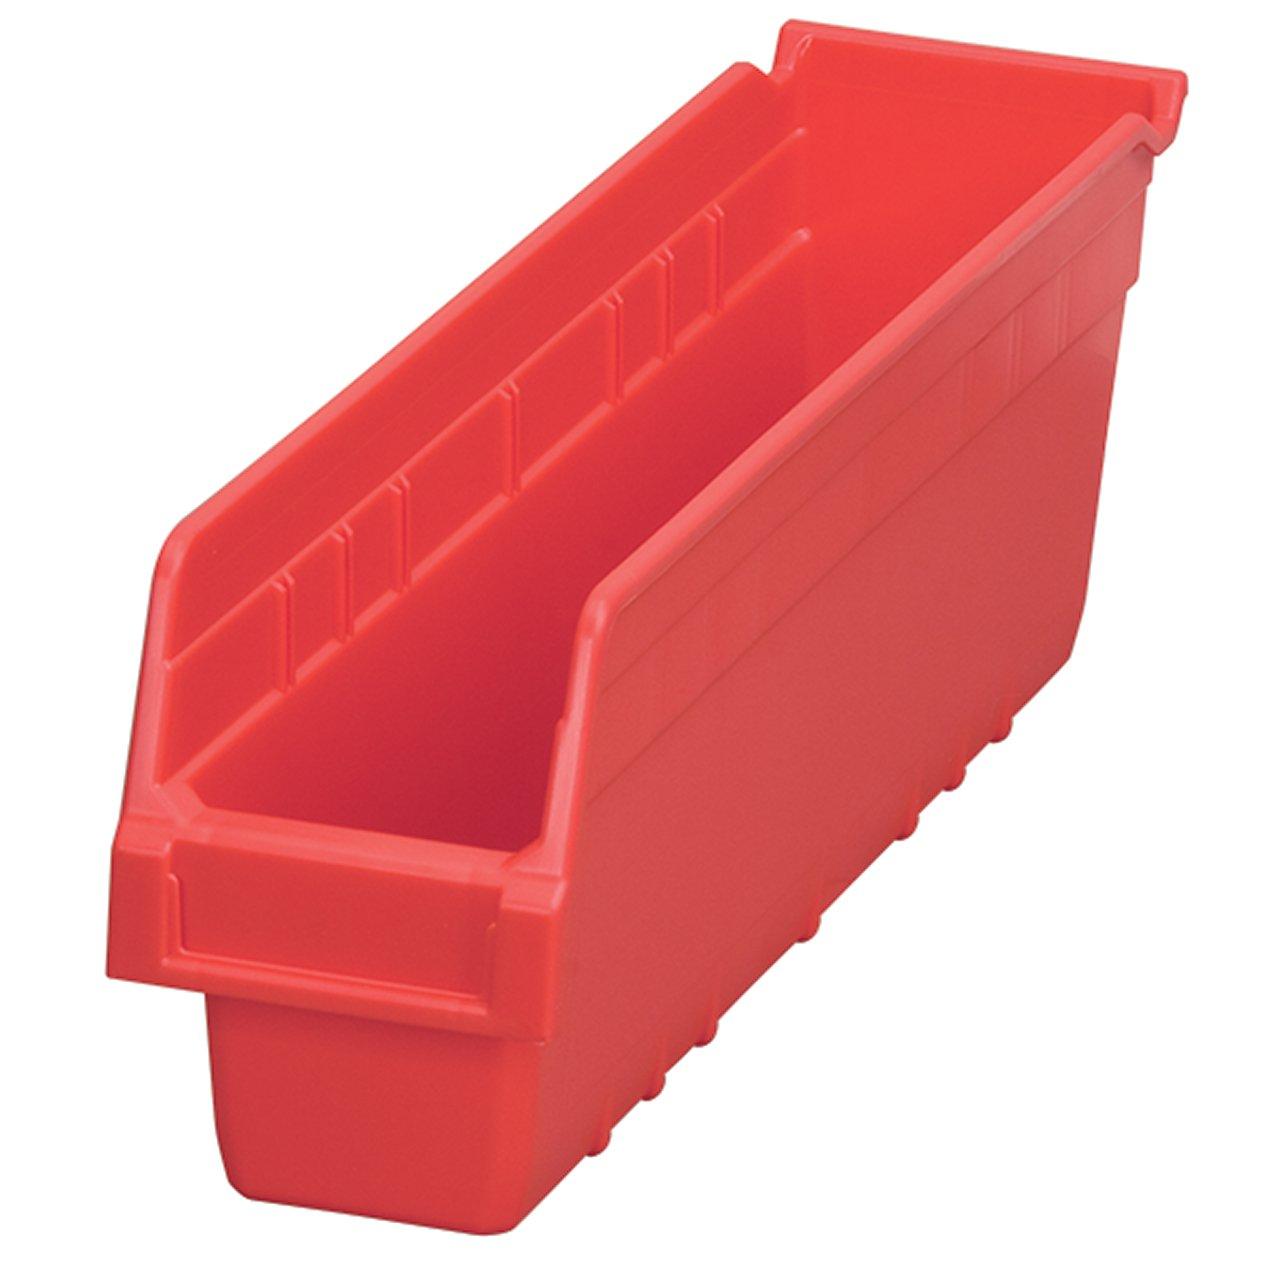 Akro-Mils 30048 ShelfMax Plastic Nesting Shelf Bin Box, 18-Inch Length x 4-Inch Width x 6-Inch Height, Case of 8, Red by Akro-Mils